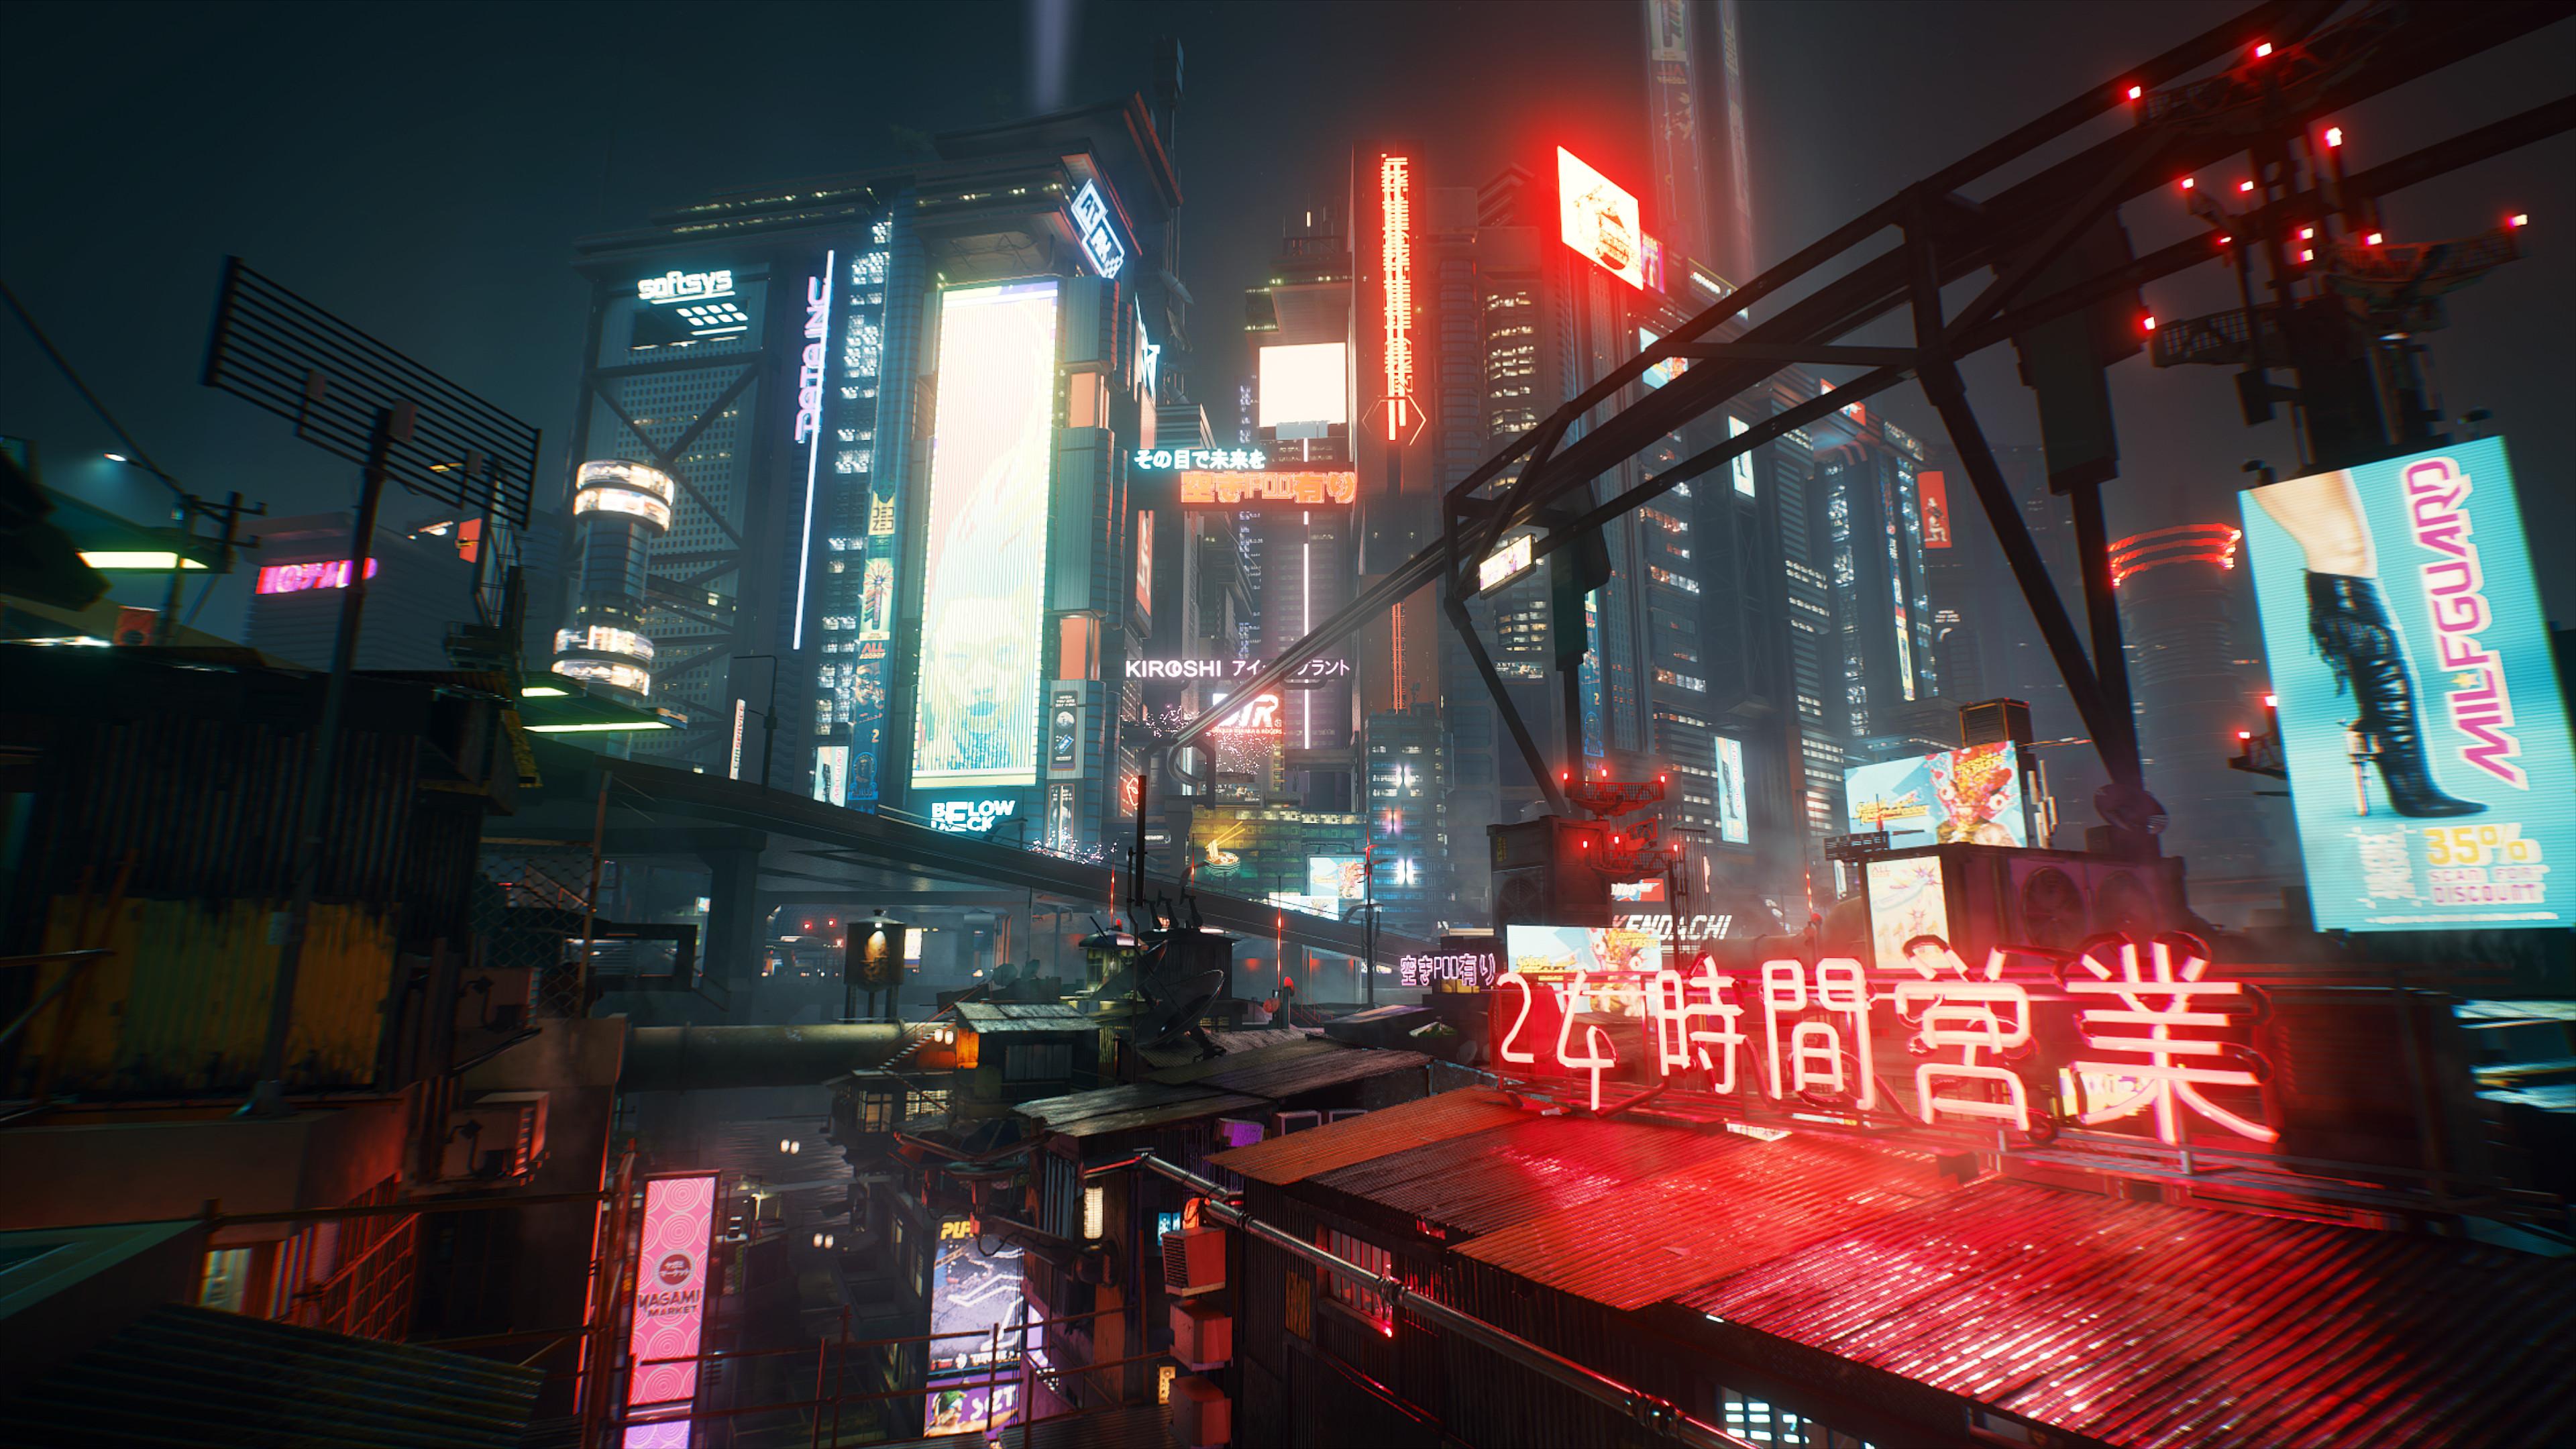 A Night City overhead view in Cyberpunk 2077